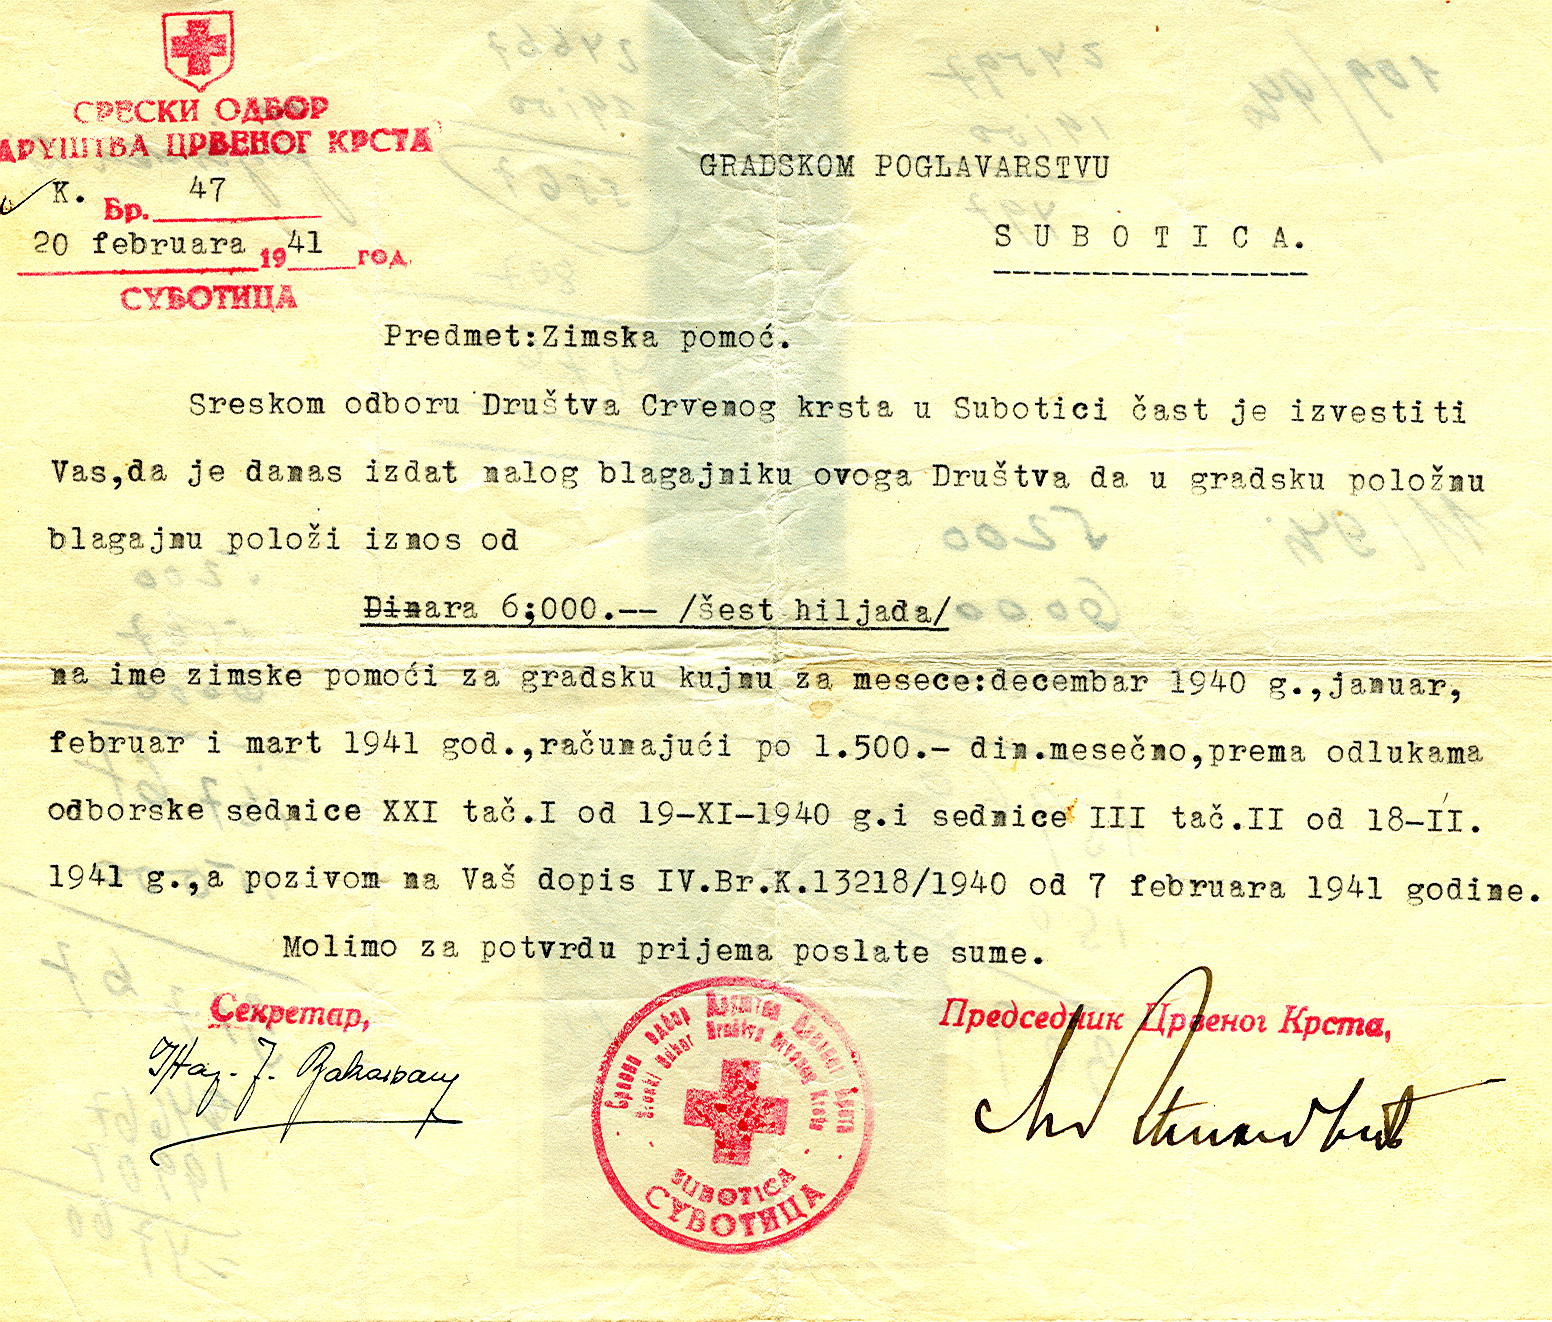 47.IV 1932.1941